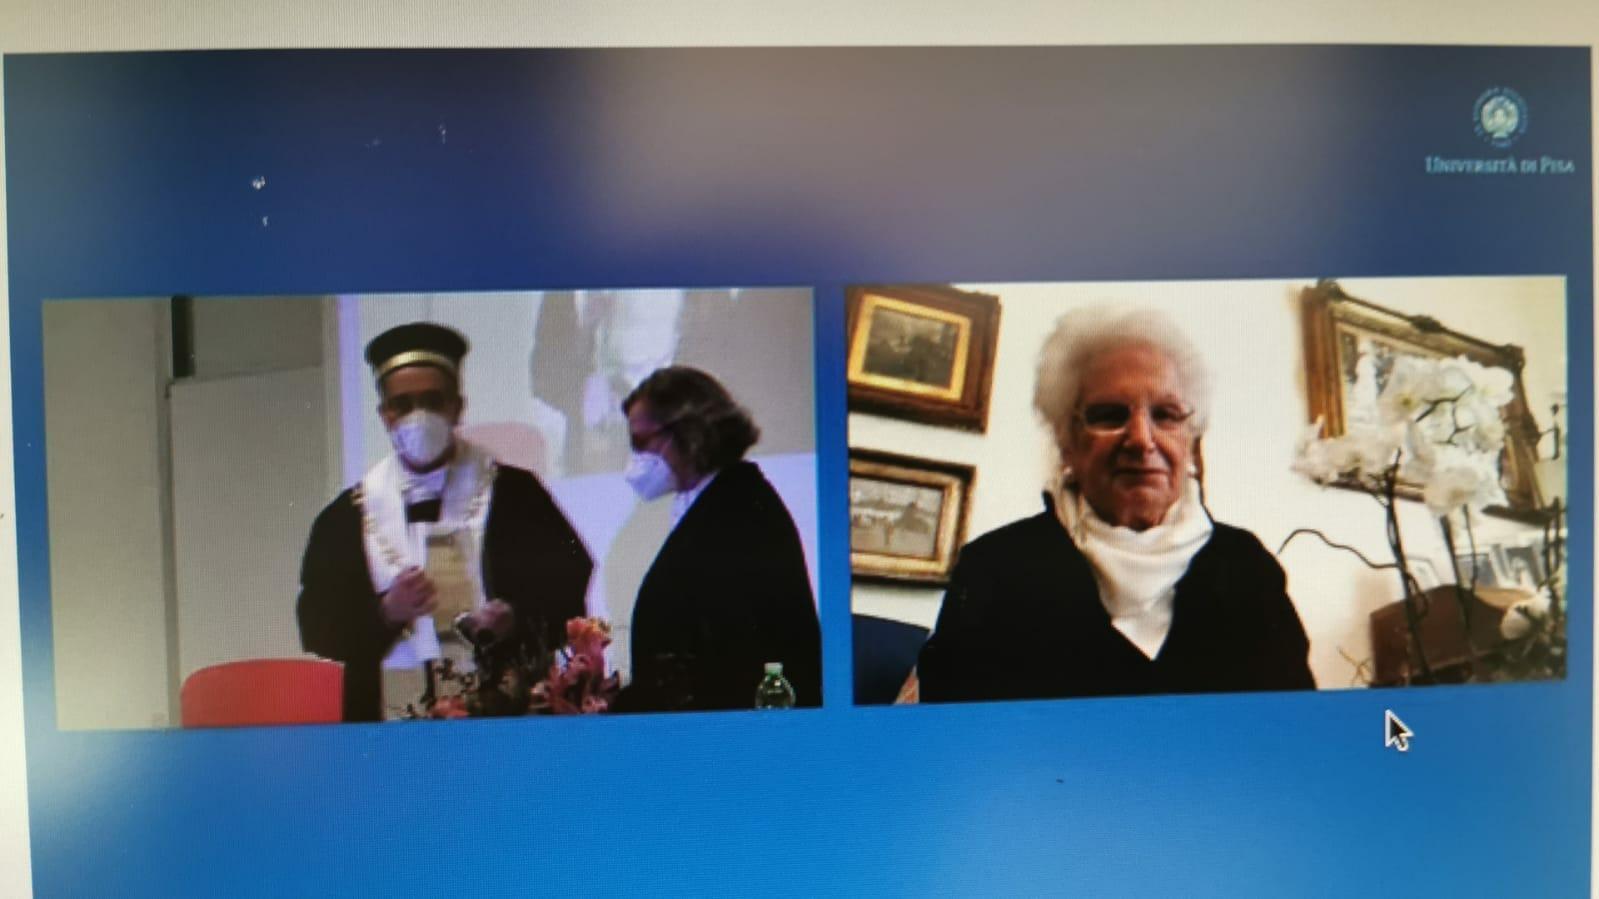 liliana segre laurea honoris